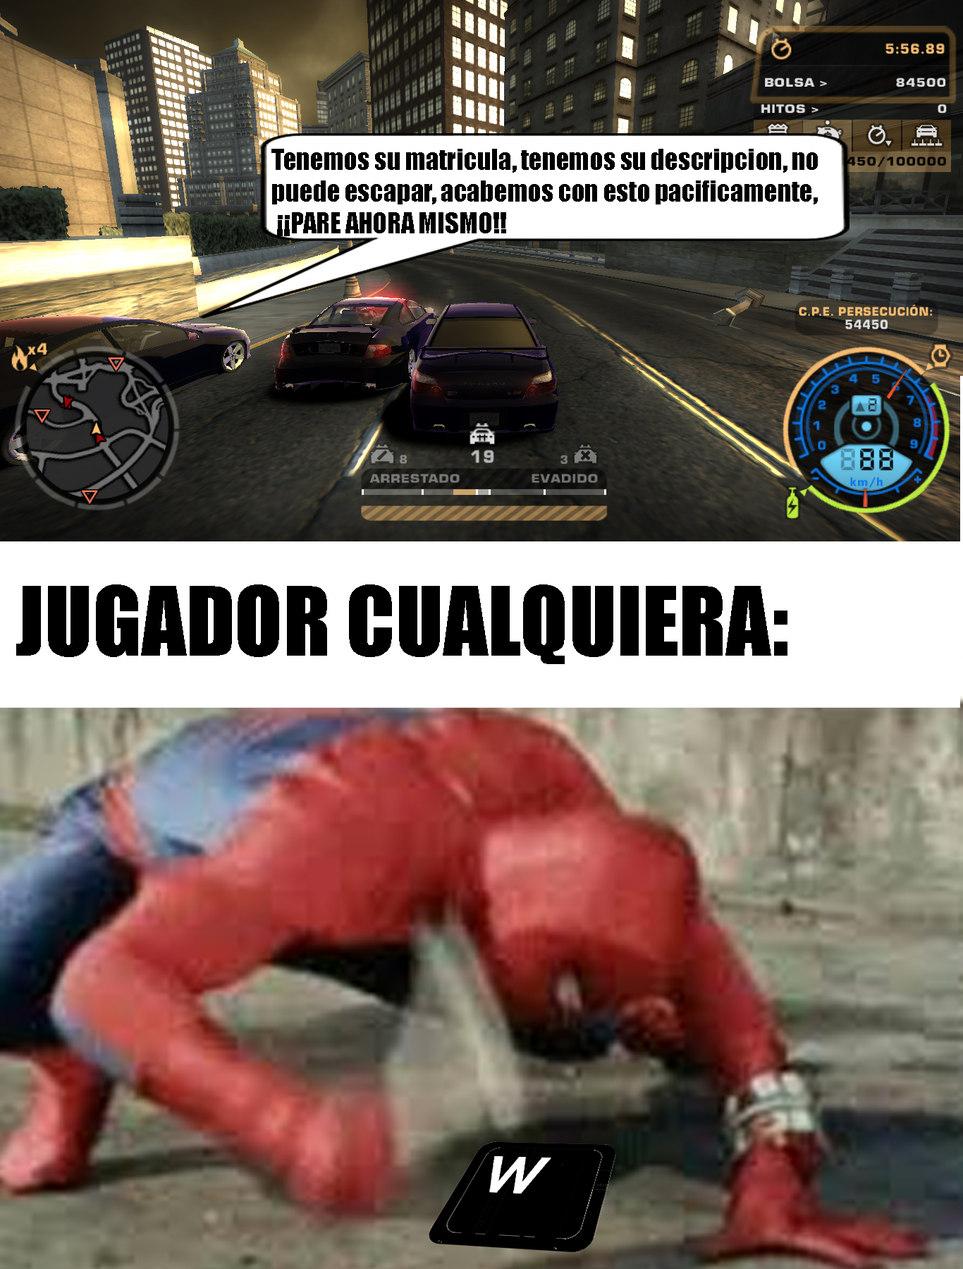 ¡¡¡LA MAXIMA POTENCIA!!! - meme